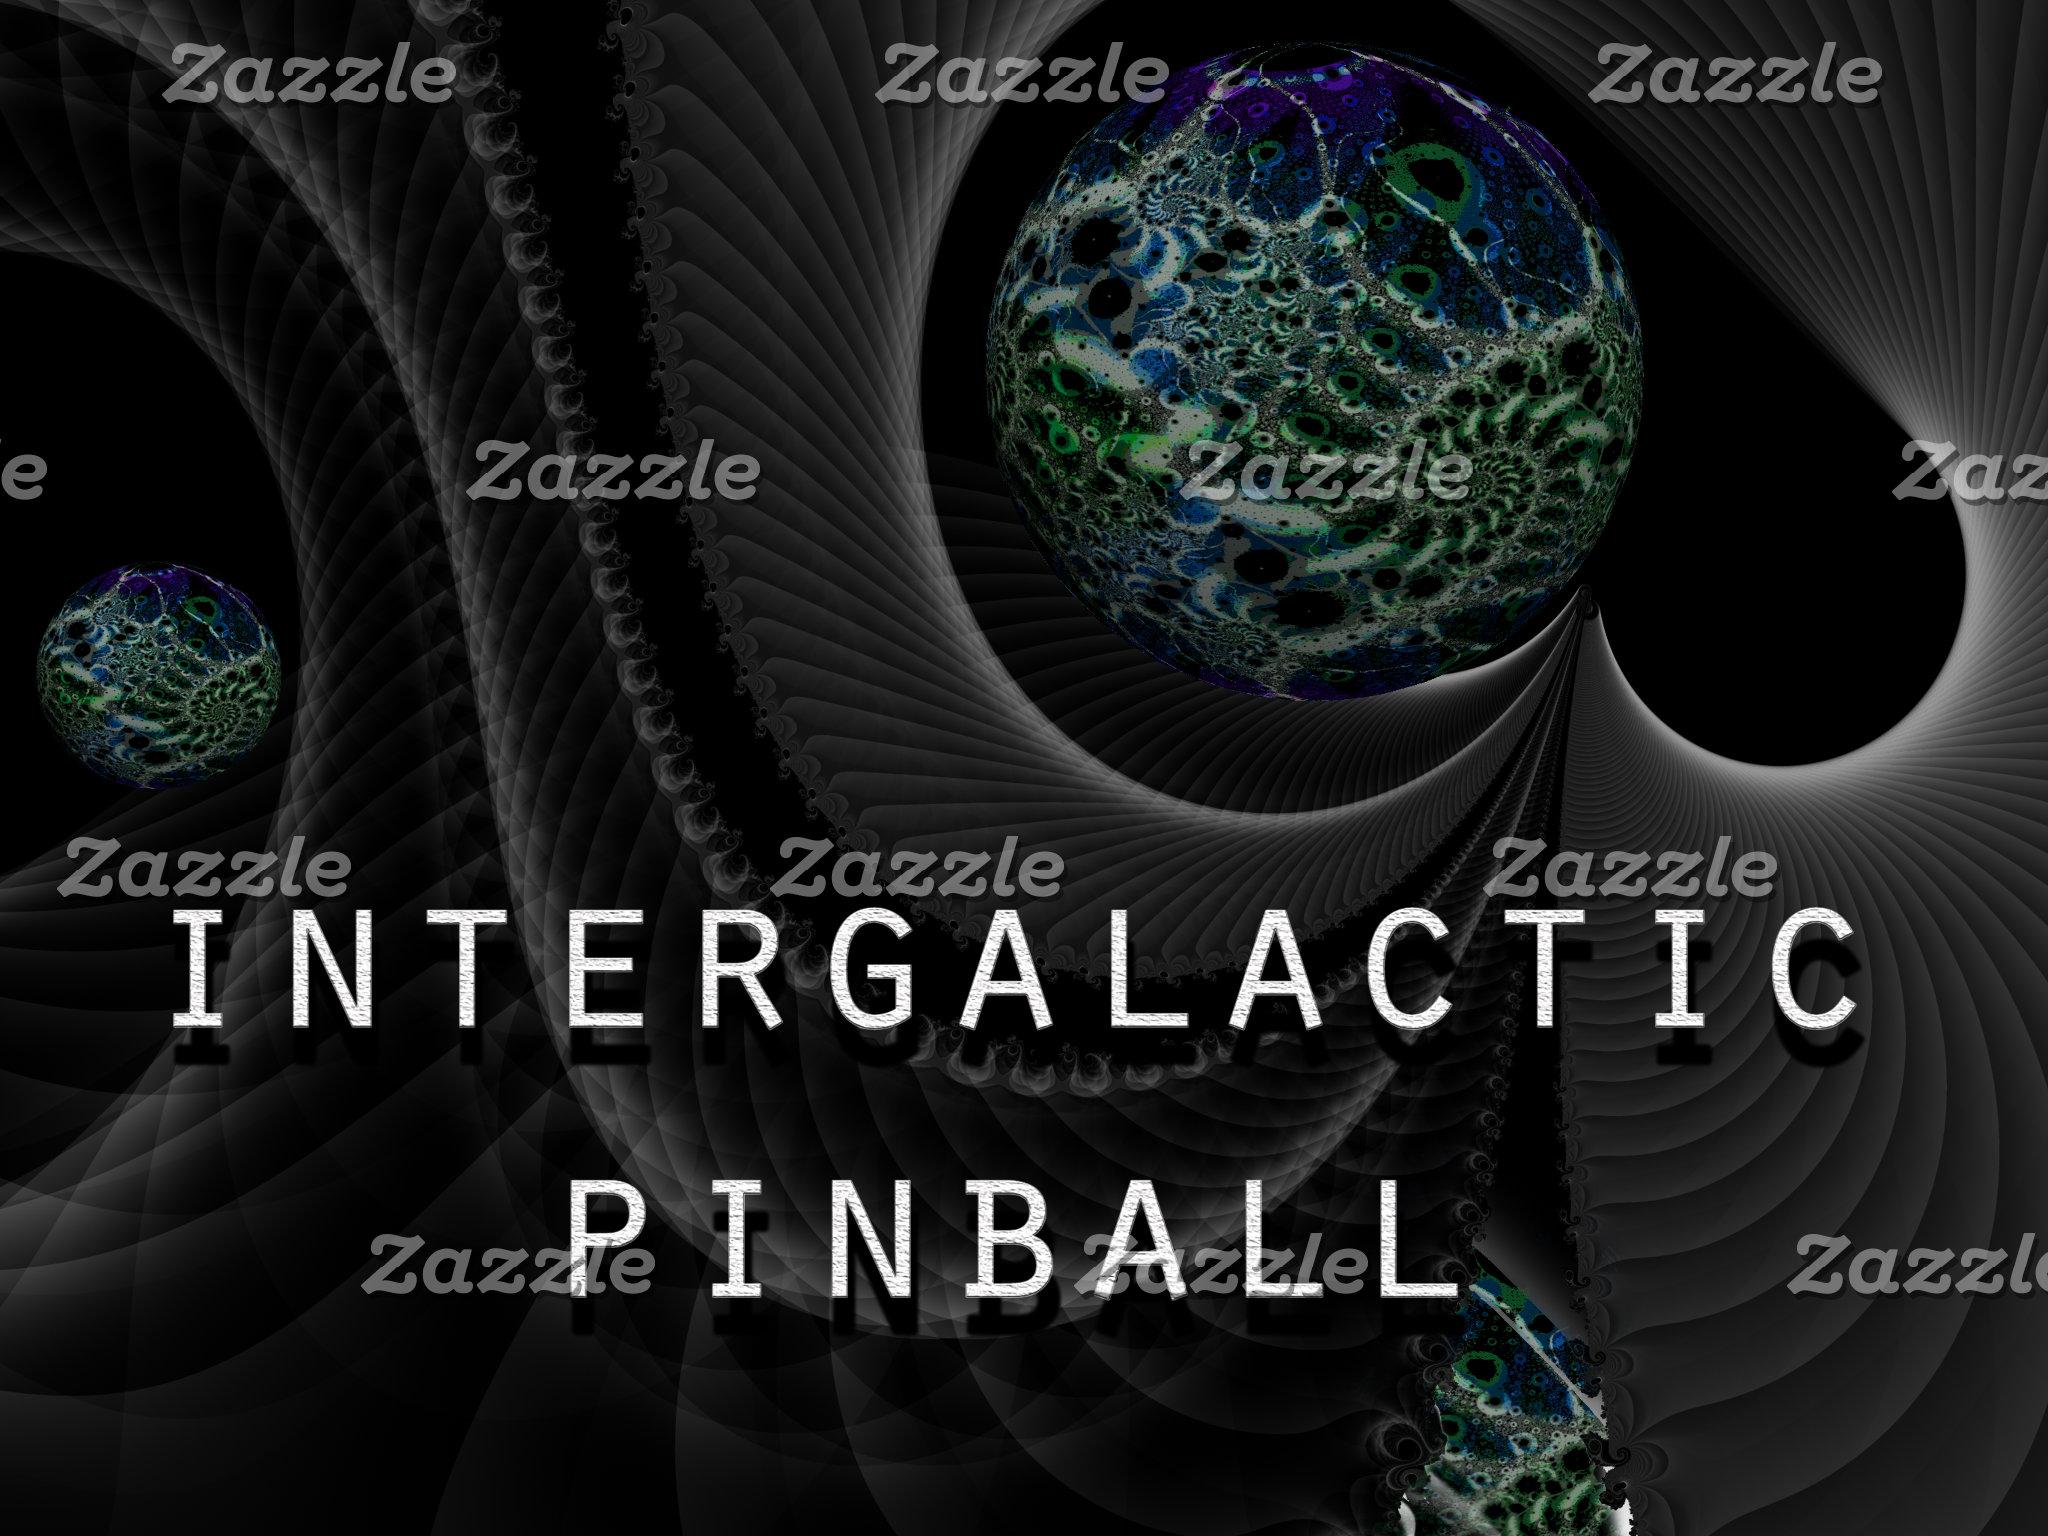 Intergalactic Pinball